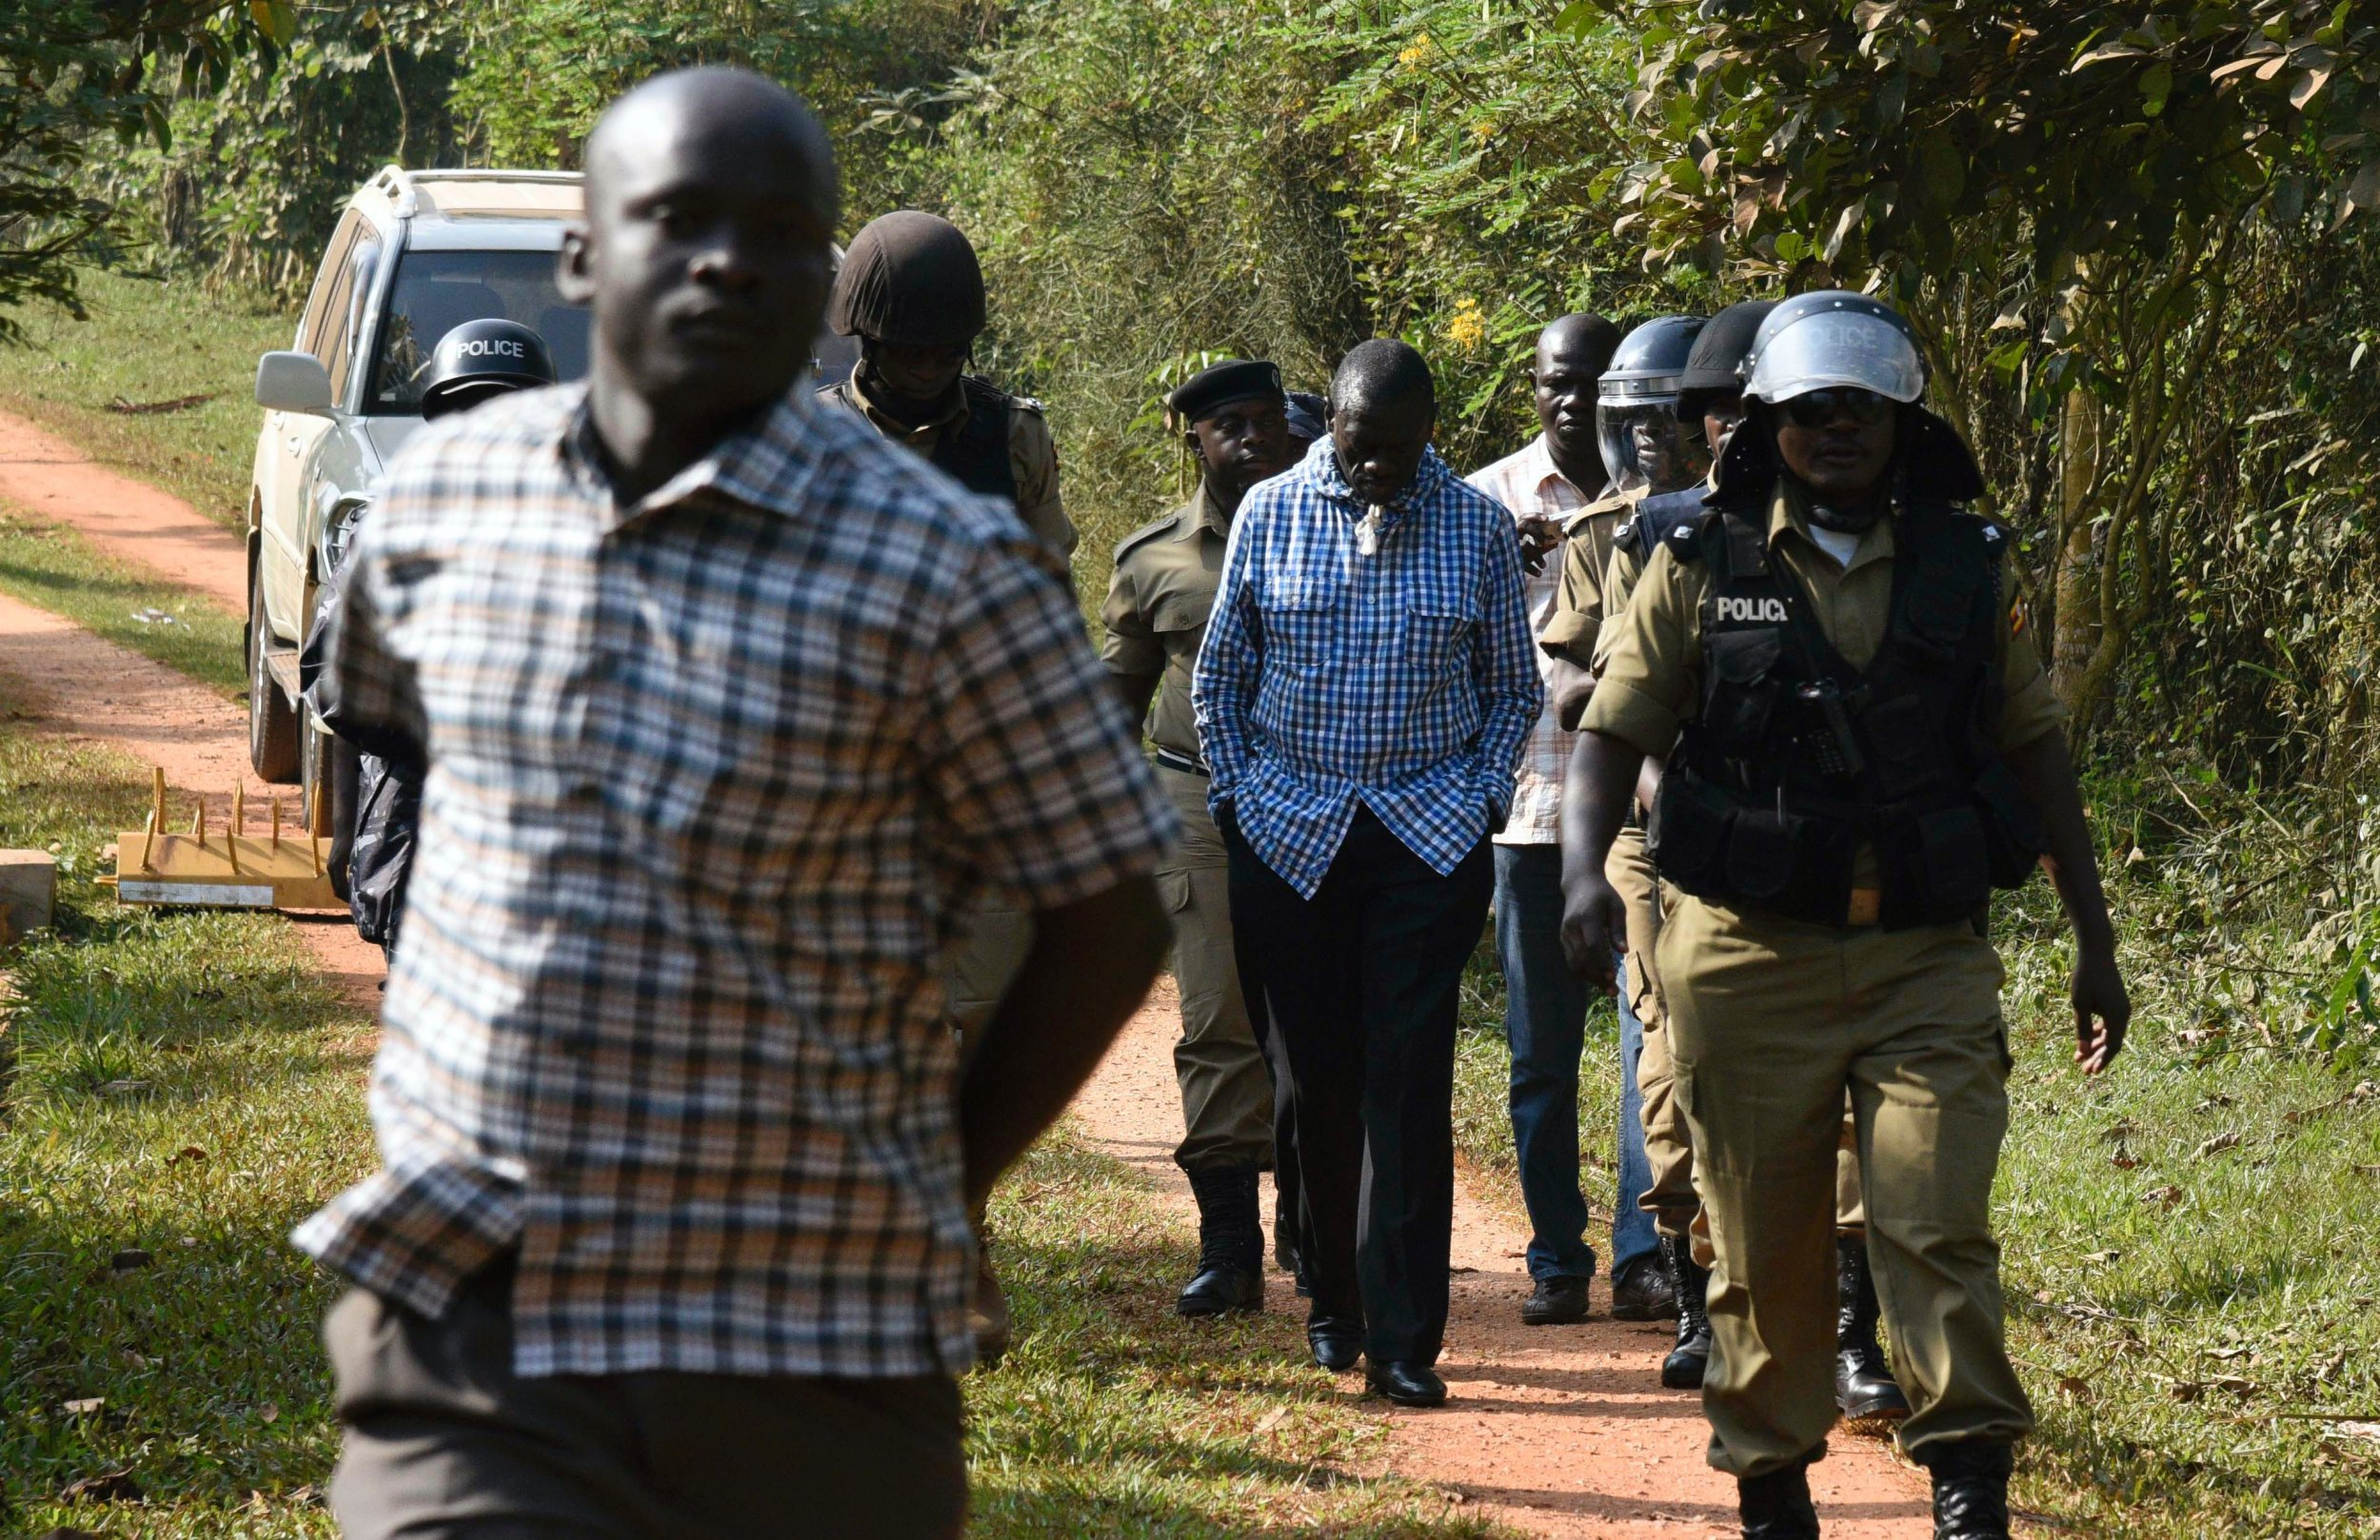 Kizza Besigye is escorted to a police vehicle in Kampala.